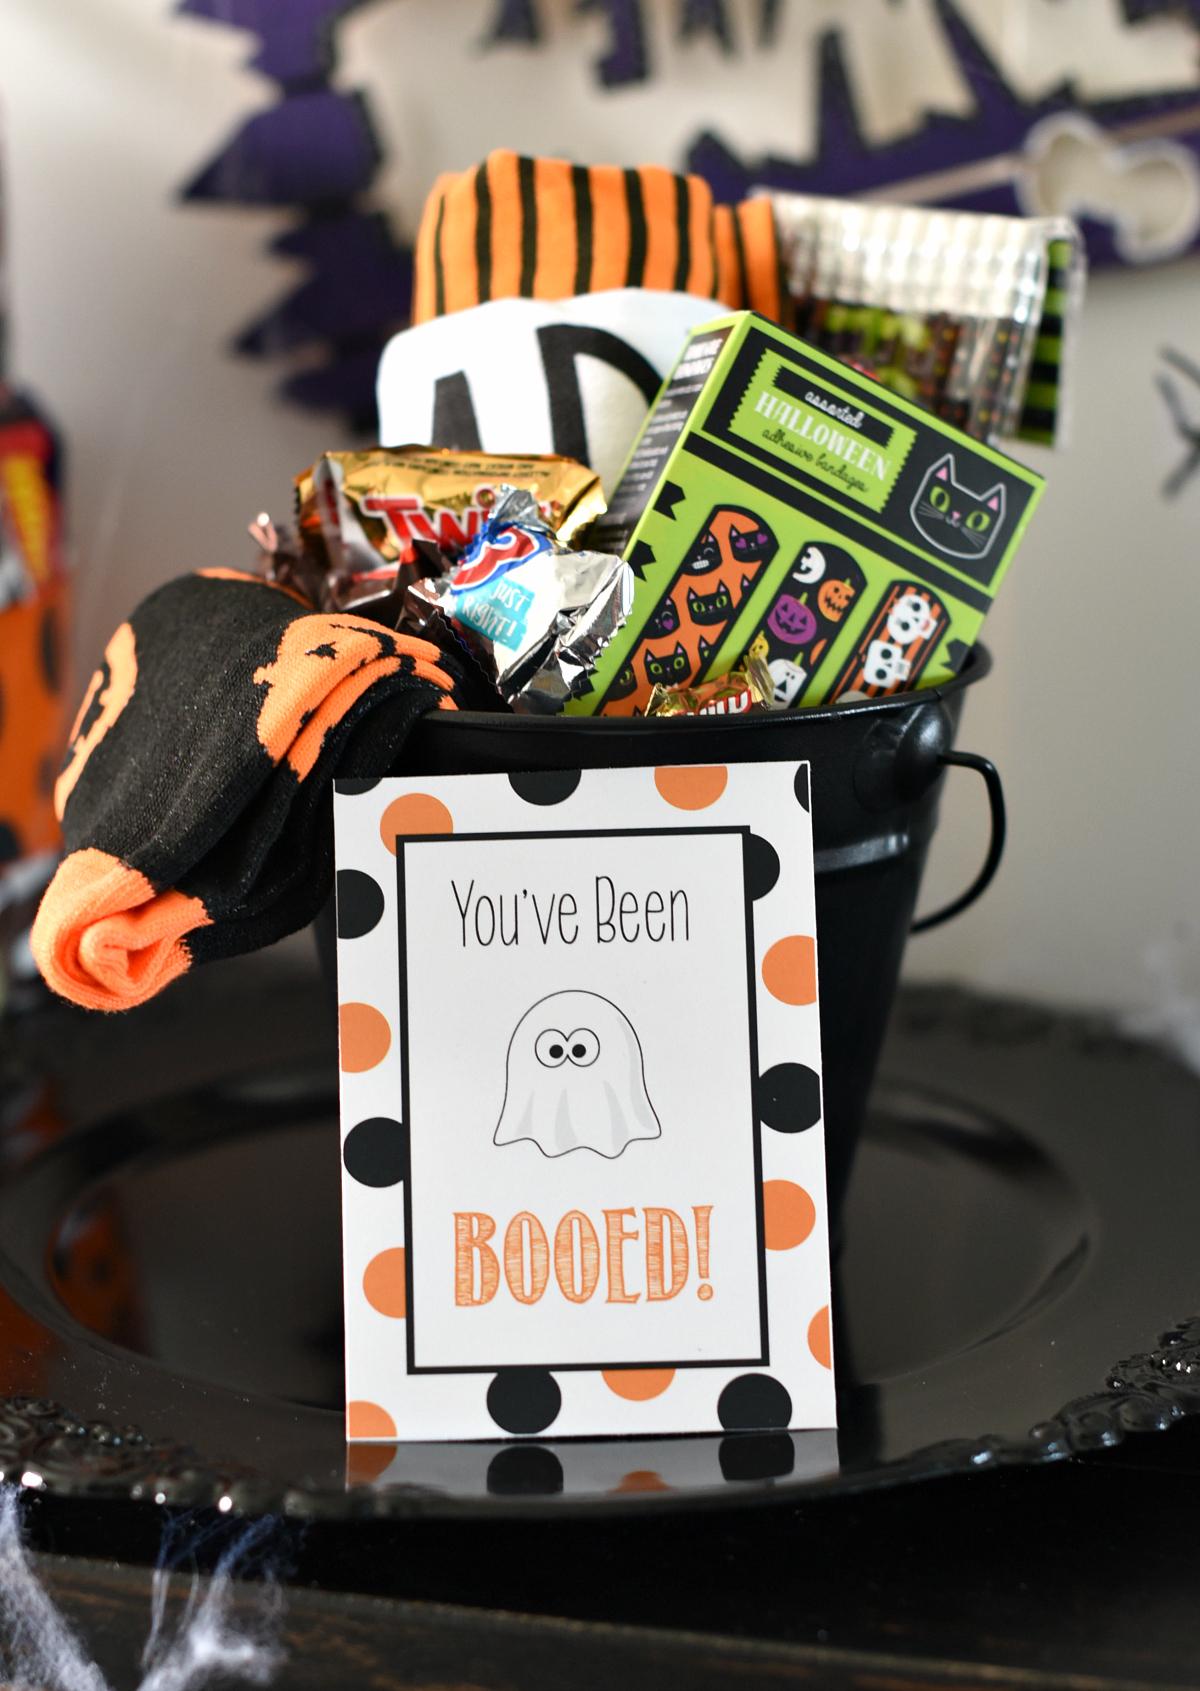 photo regarding You've Been Booed Printable named Youve Been Booed - Lovable Cost-free Printable Tags Halloween